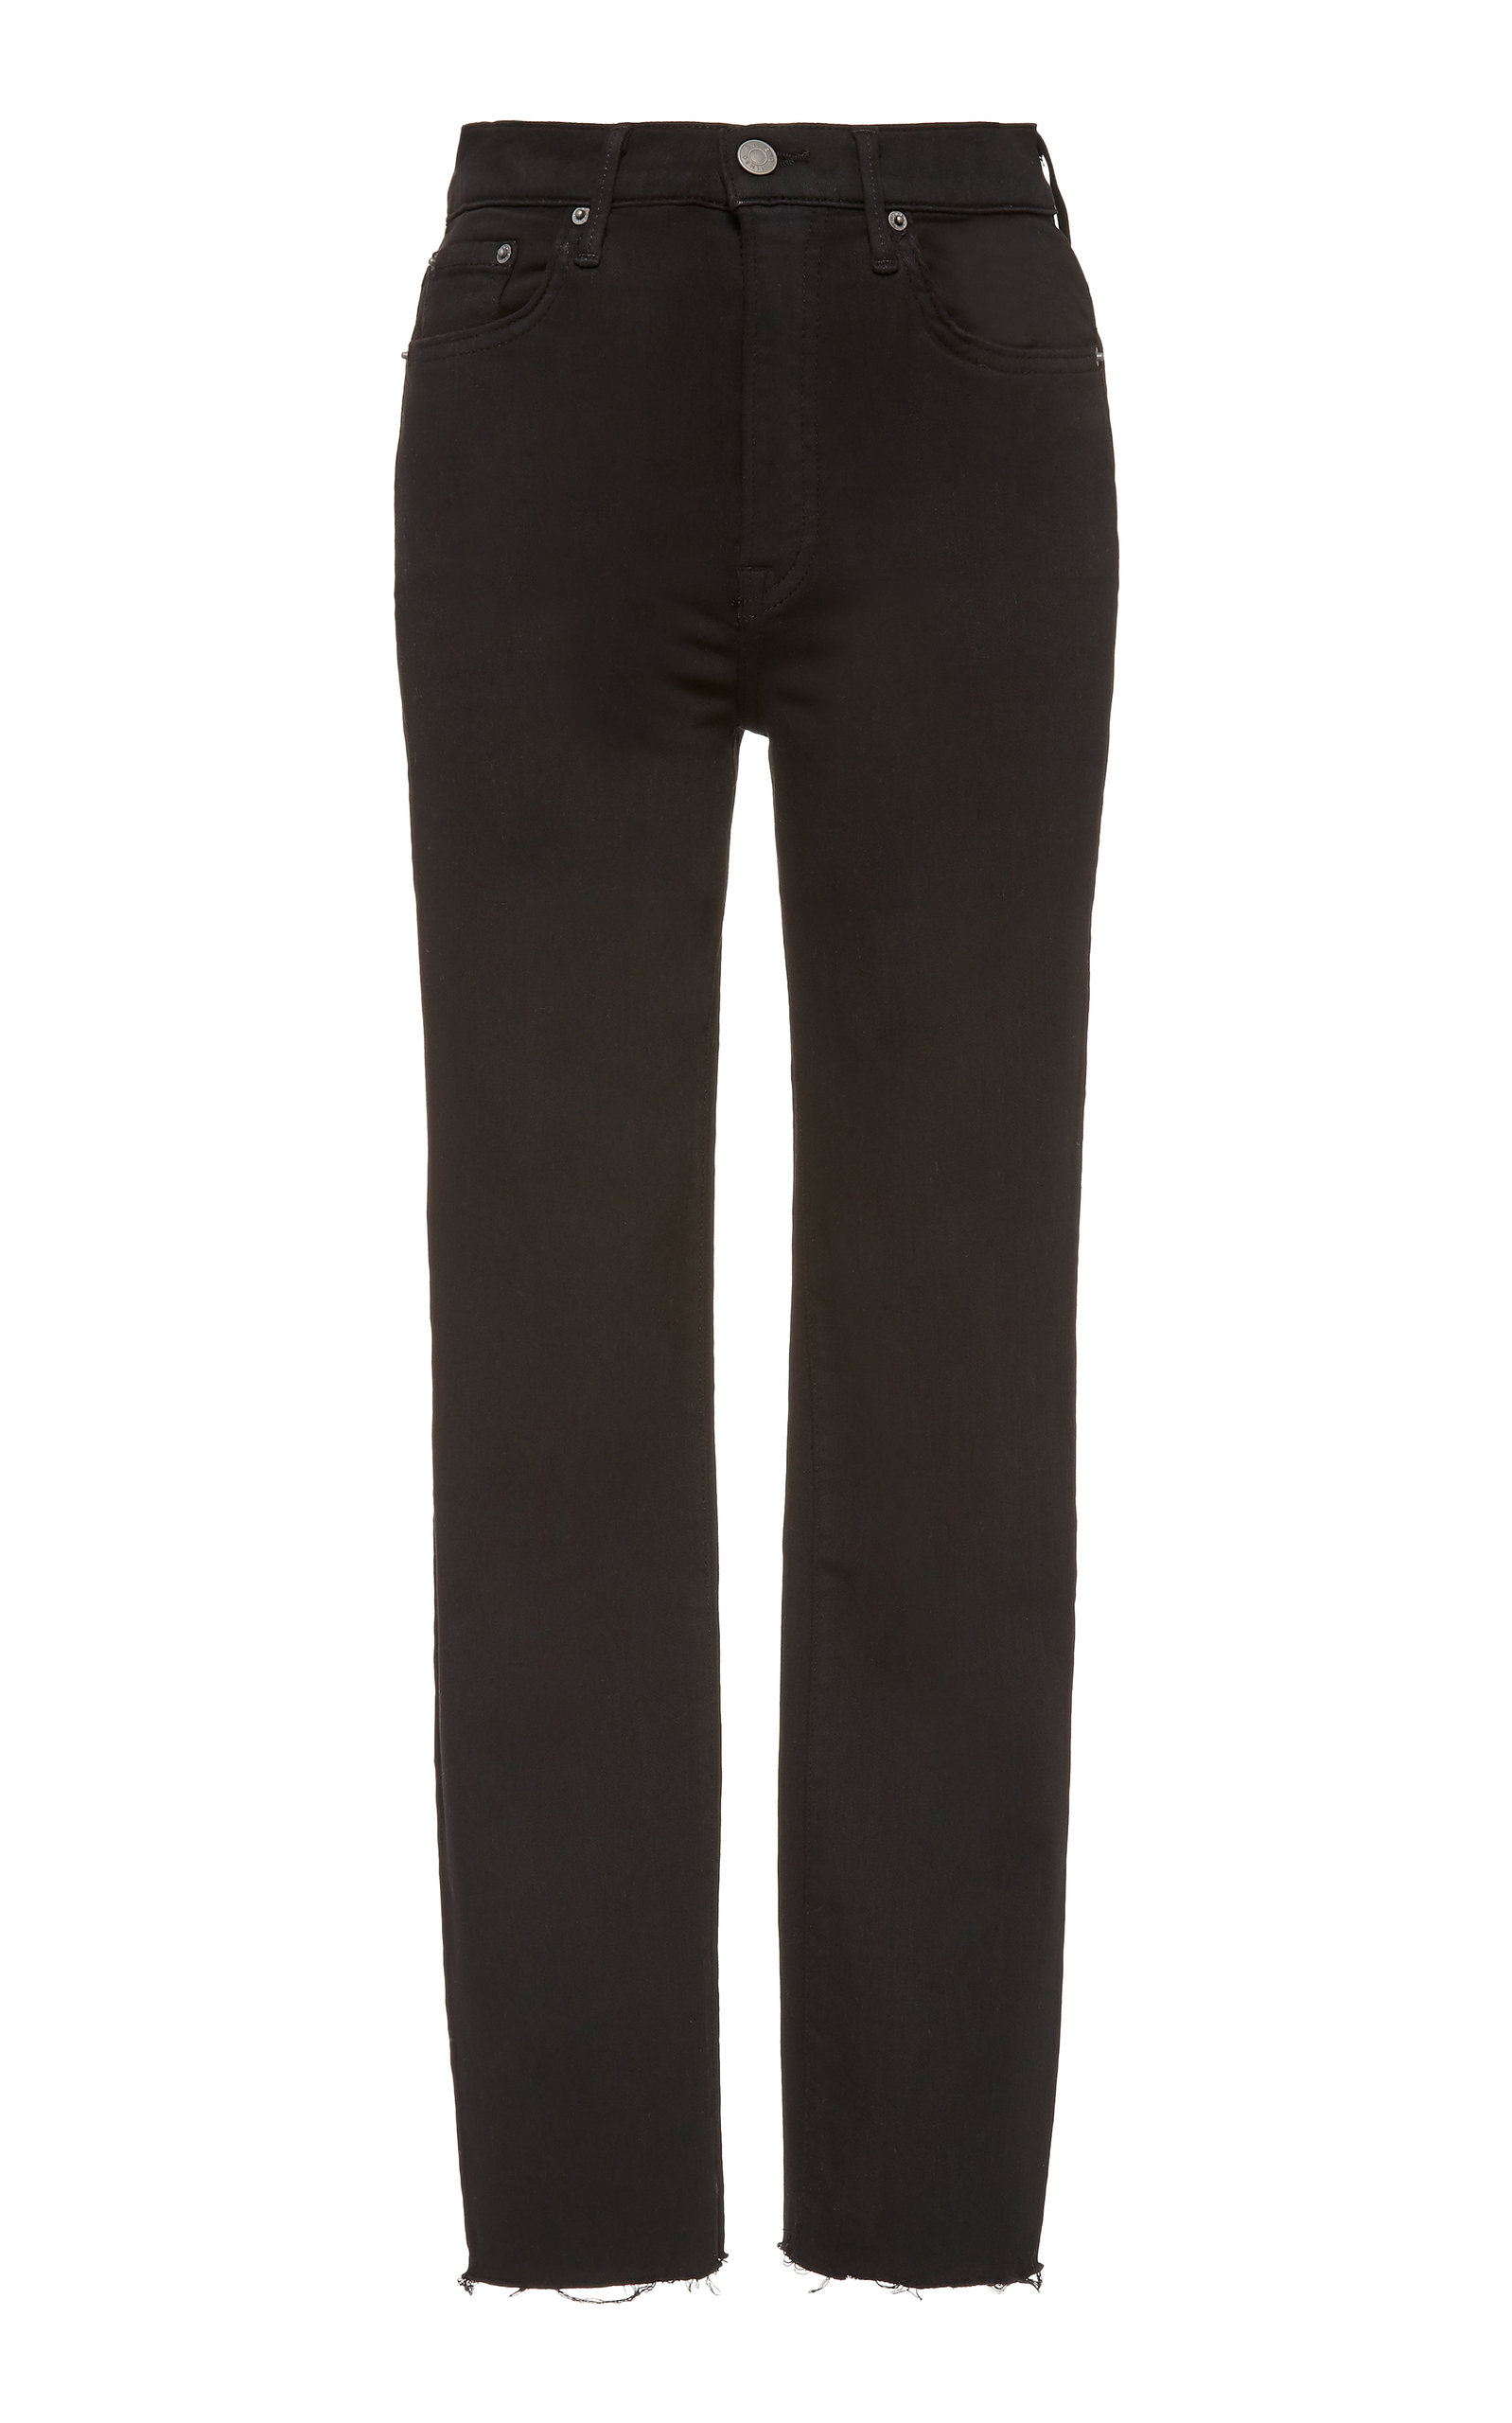 Grlfrnd Jeans REED CROPPED CIGARETTE JEANS